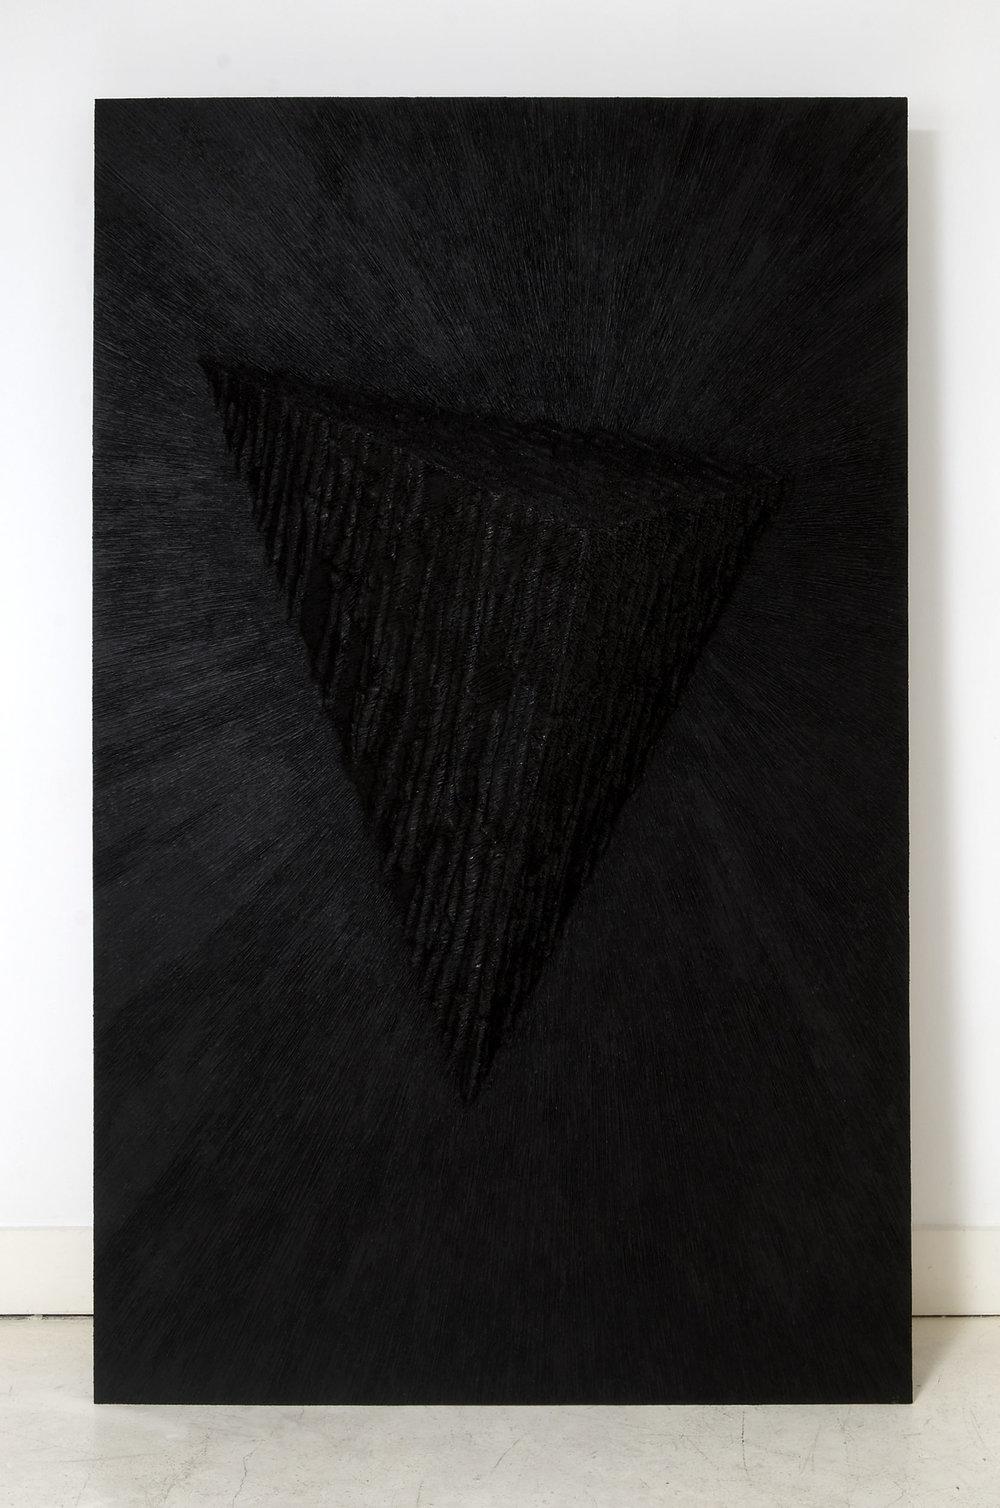 Leaning-Sculpture-&-Leaning-Sculpture-[Replica],-Board,-screws,-paper-maché,-black-board-paint,-acrylic-paint,-gel-medium,-both;-195-view-2.jpg